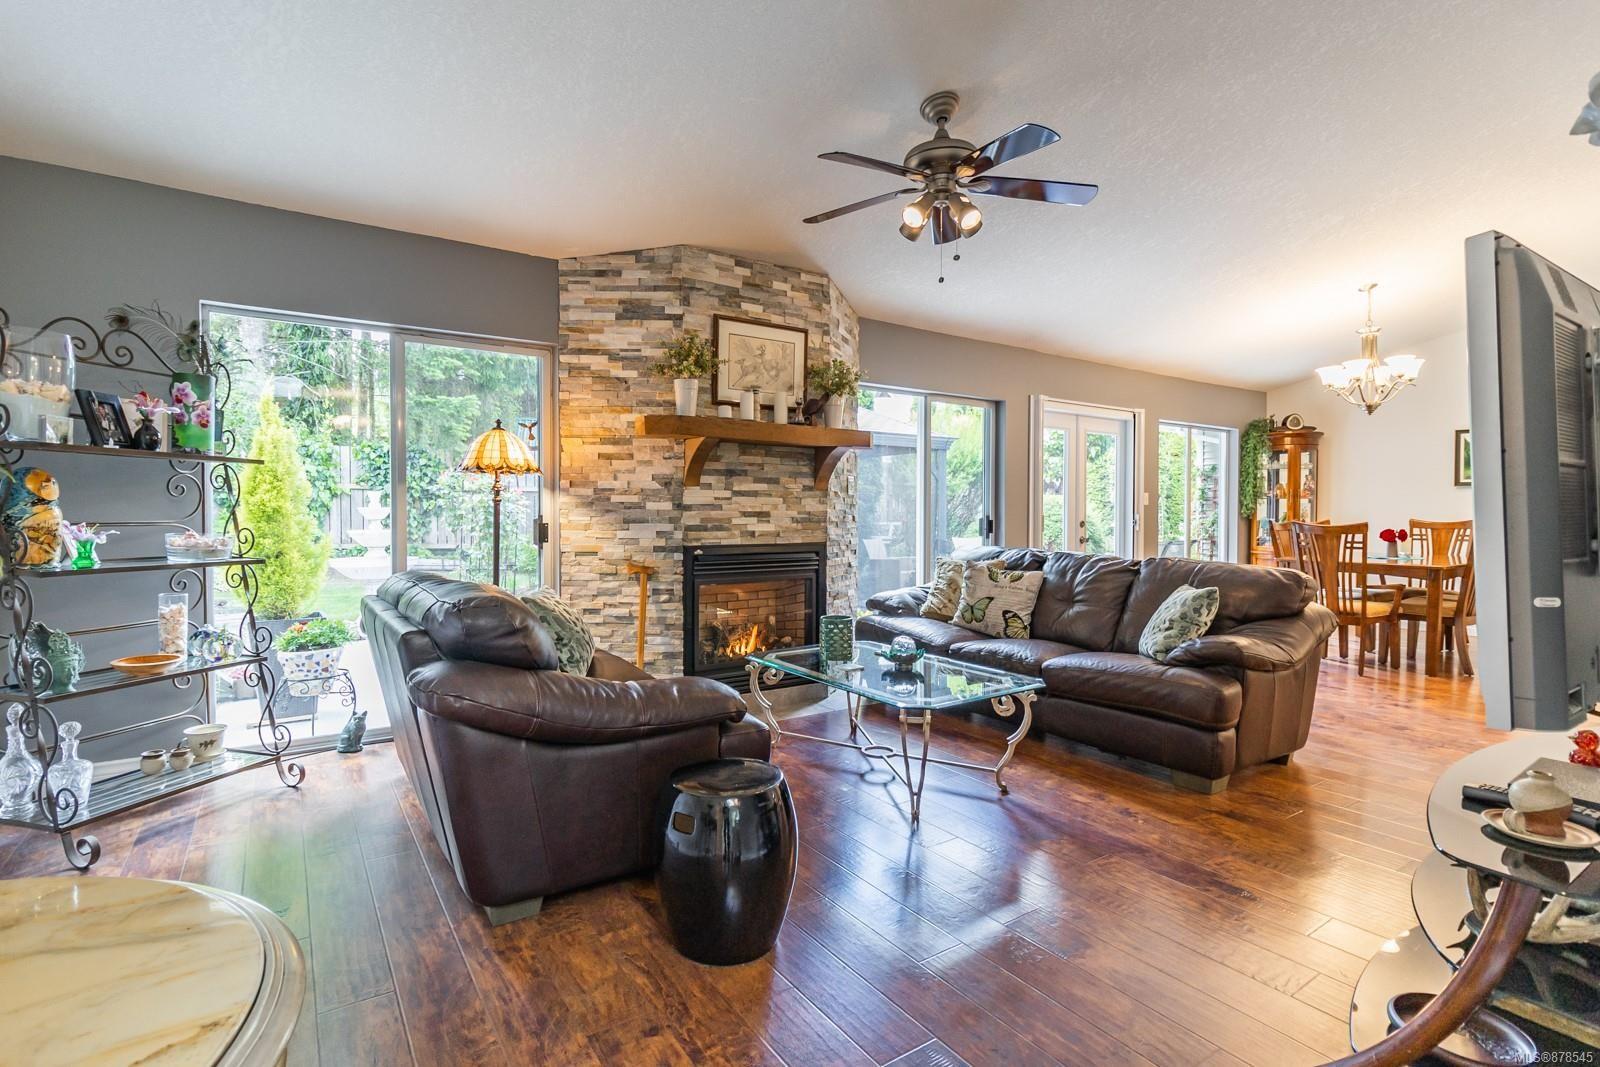 Photo 13: Photos: 1070 Symons Cres in : PQ Qualicum Beach House for sale (Parksville/Qualicum)  : MLS®# 878545